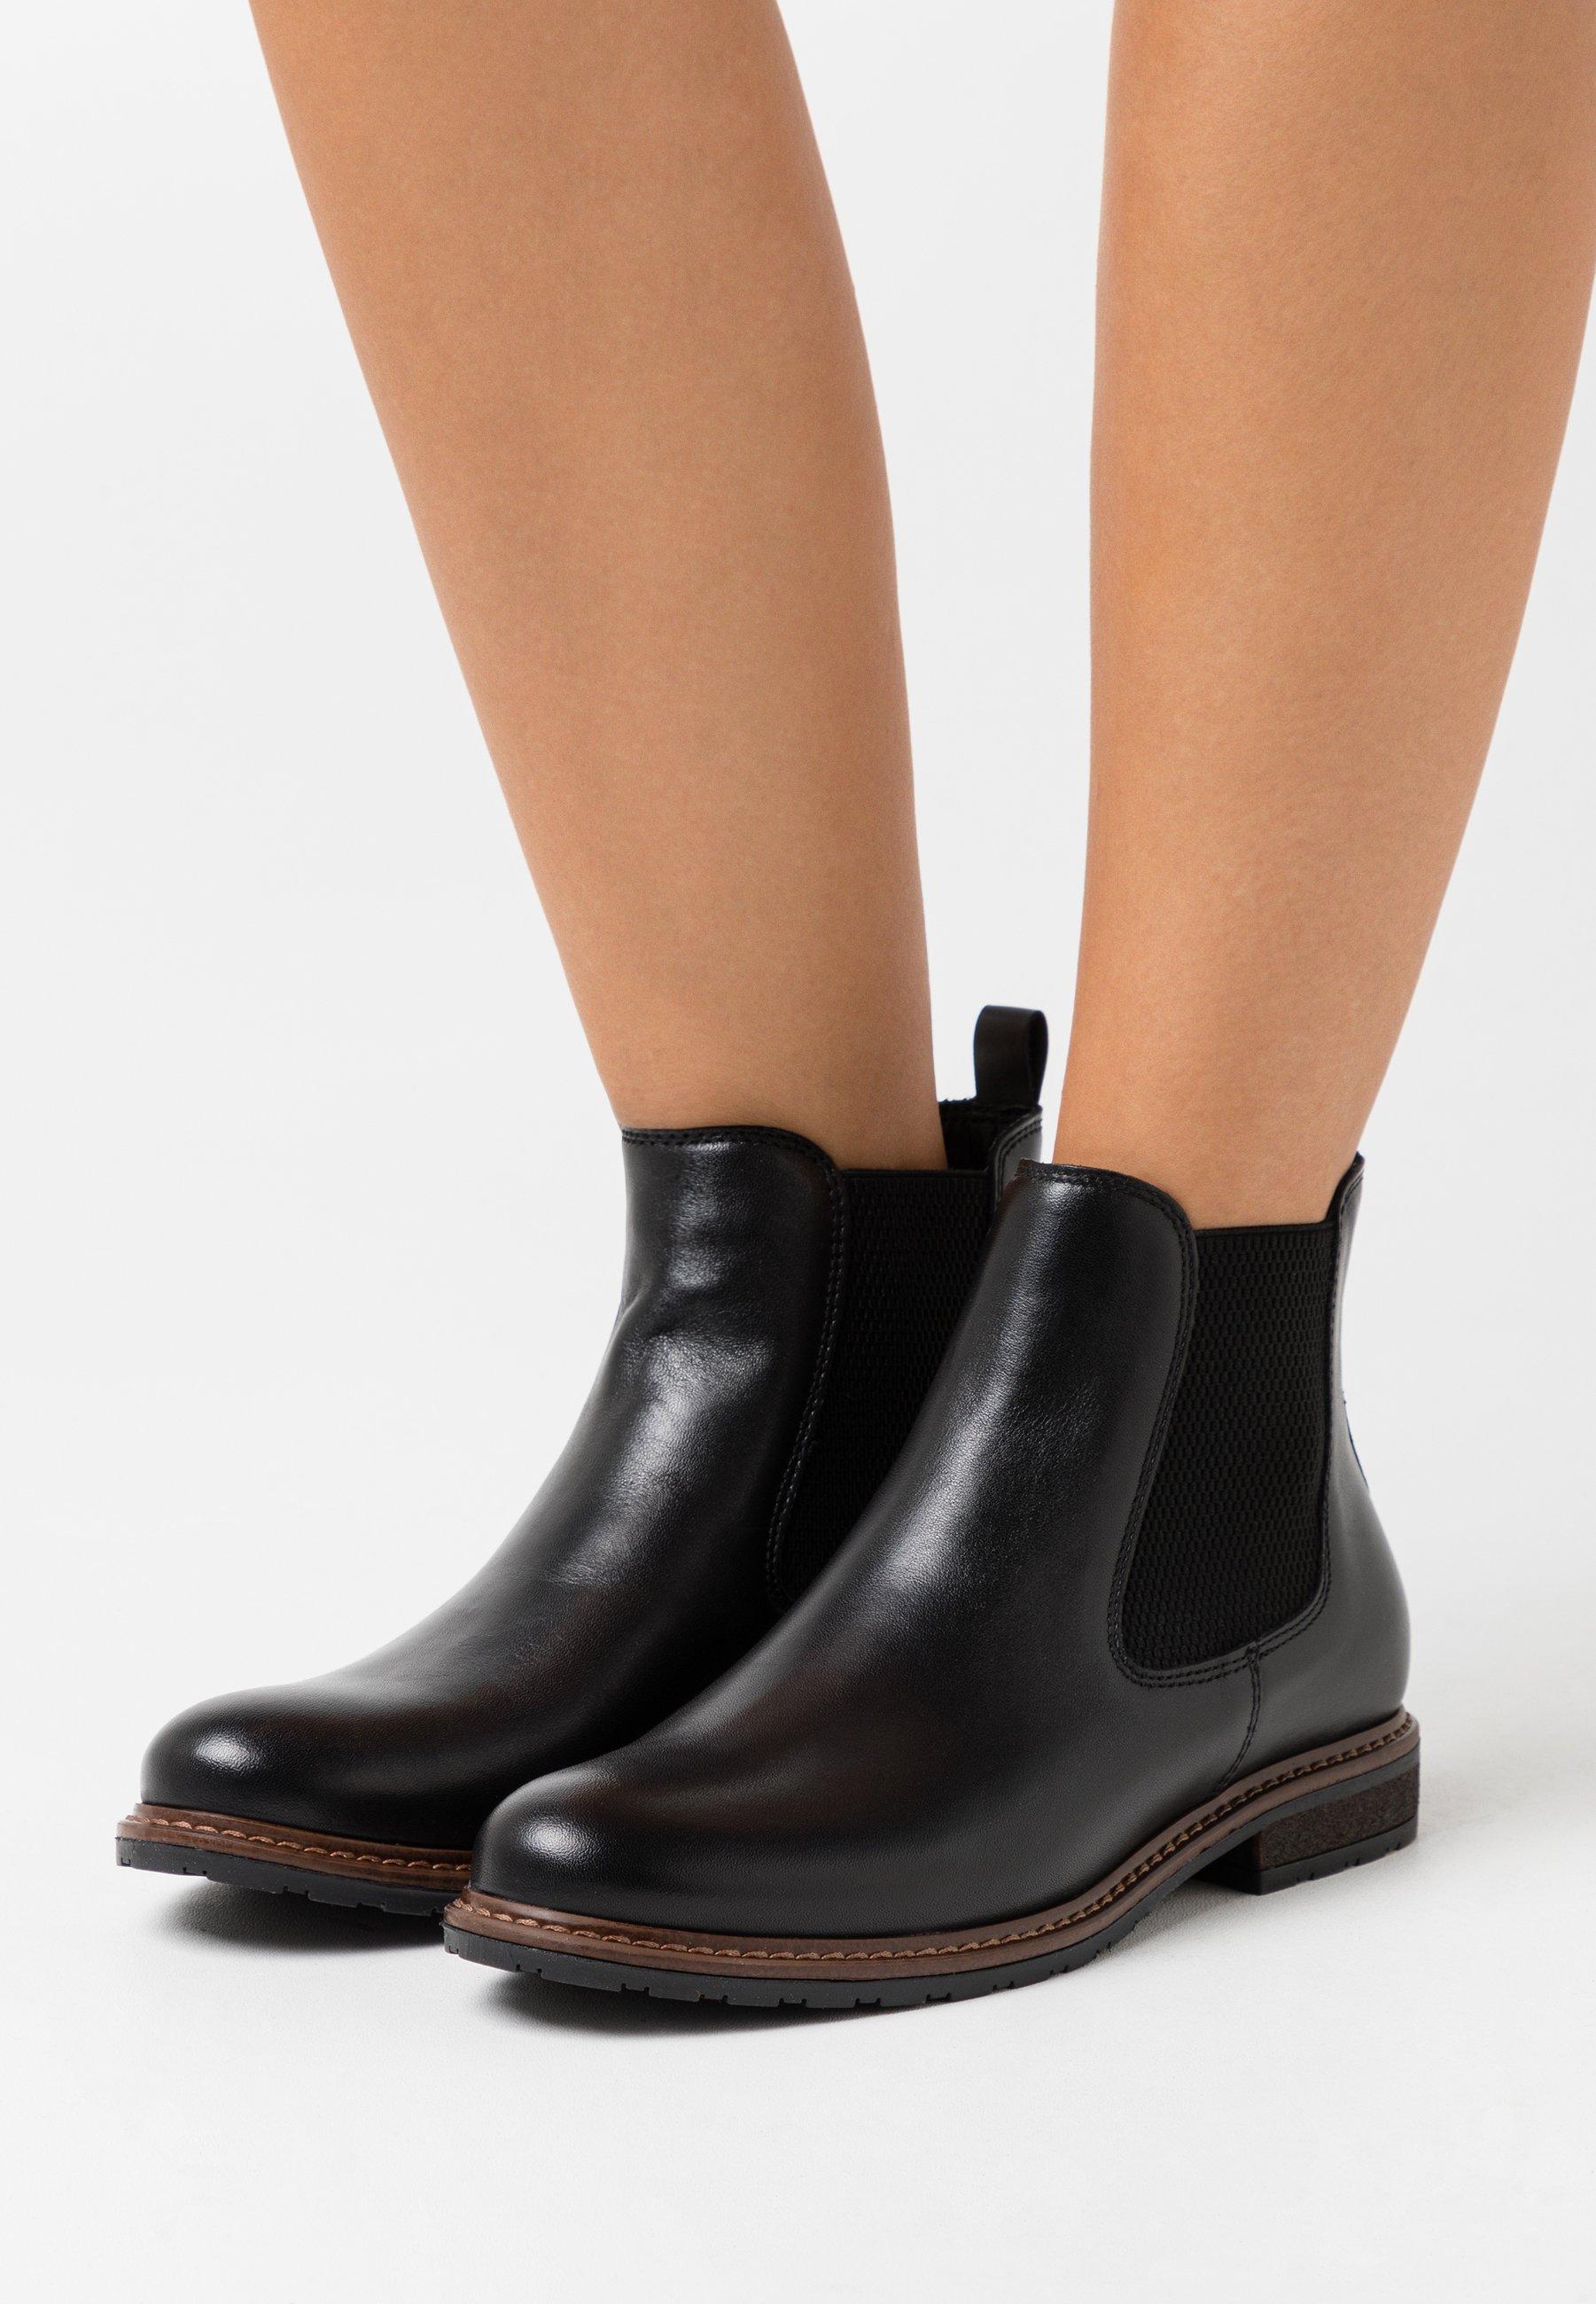 Damen BOOTS - Stiefelette - black